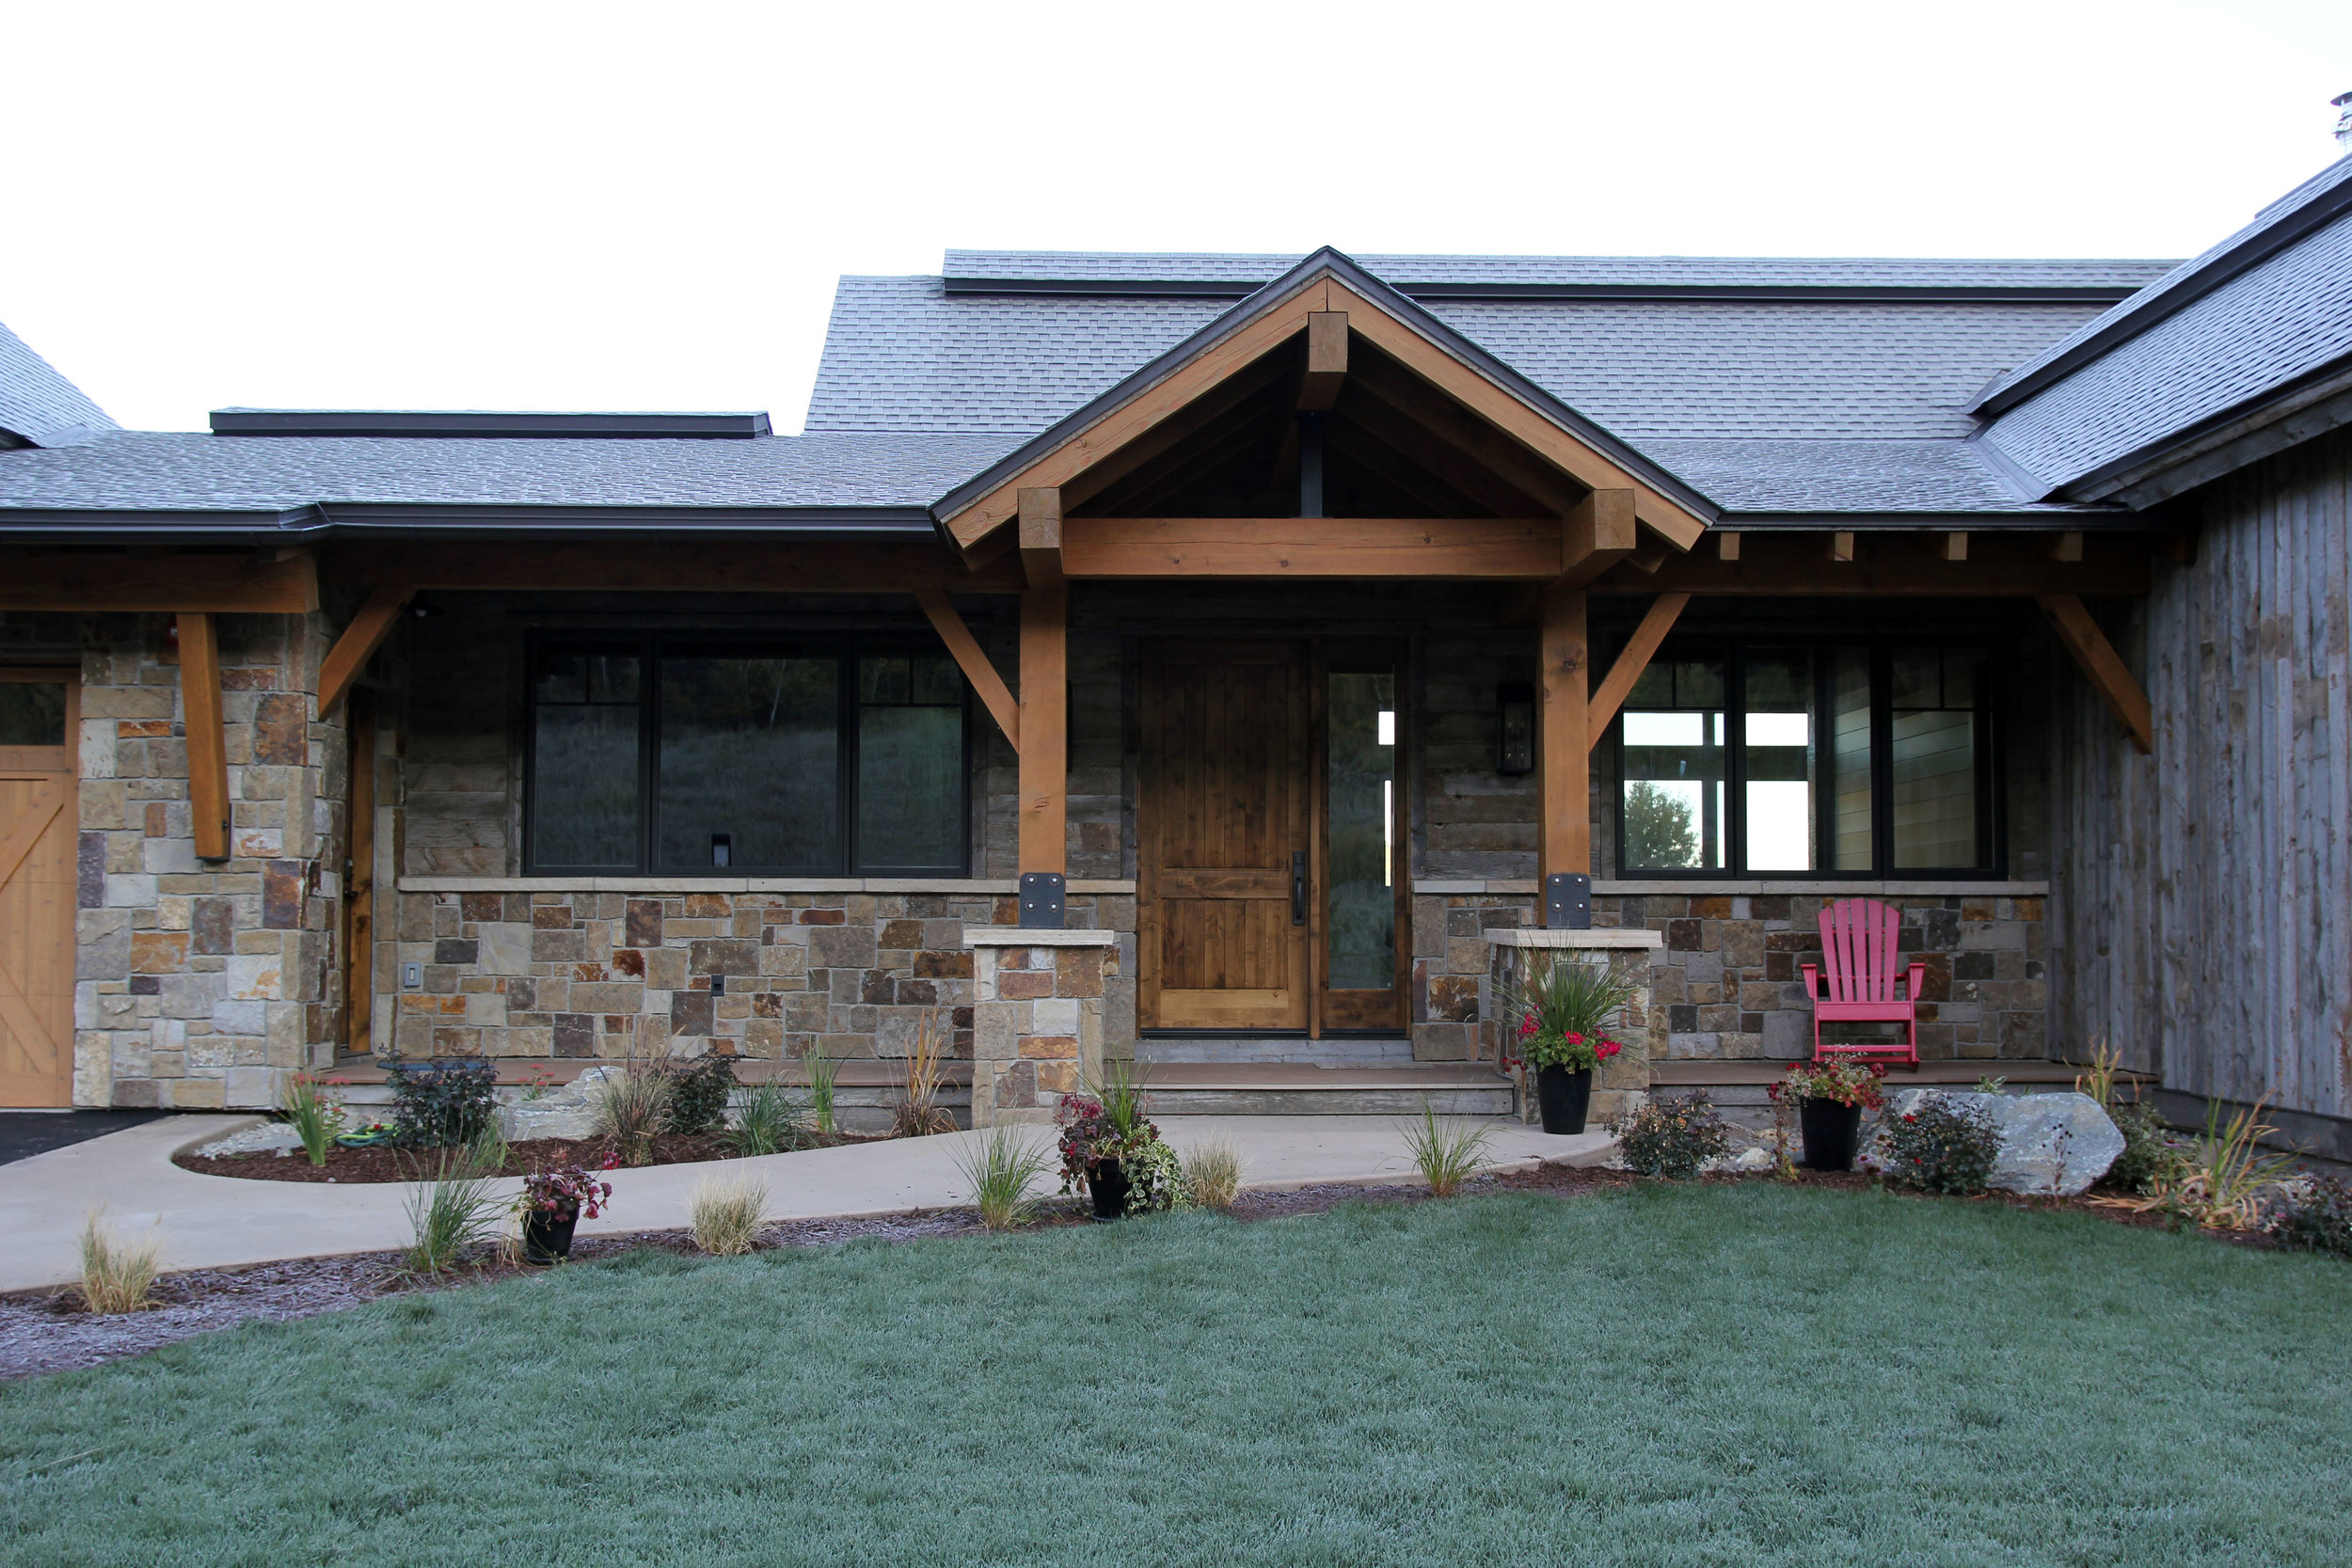 Colorado Residential Architect Sudol 12.jpg